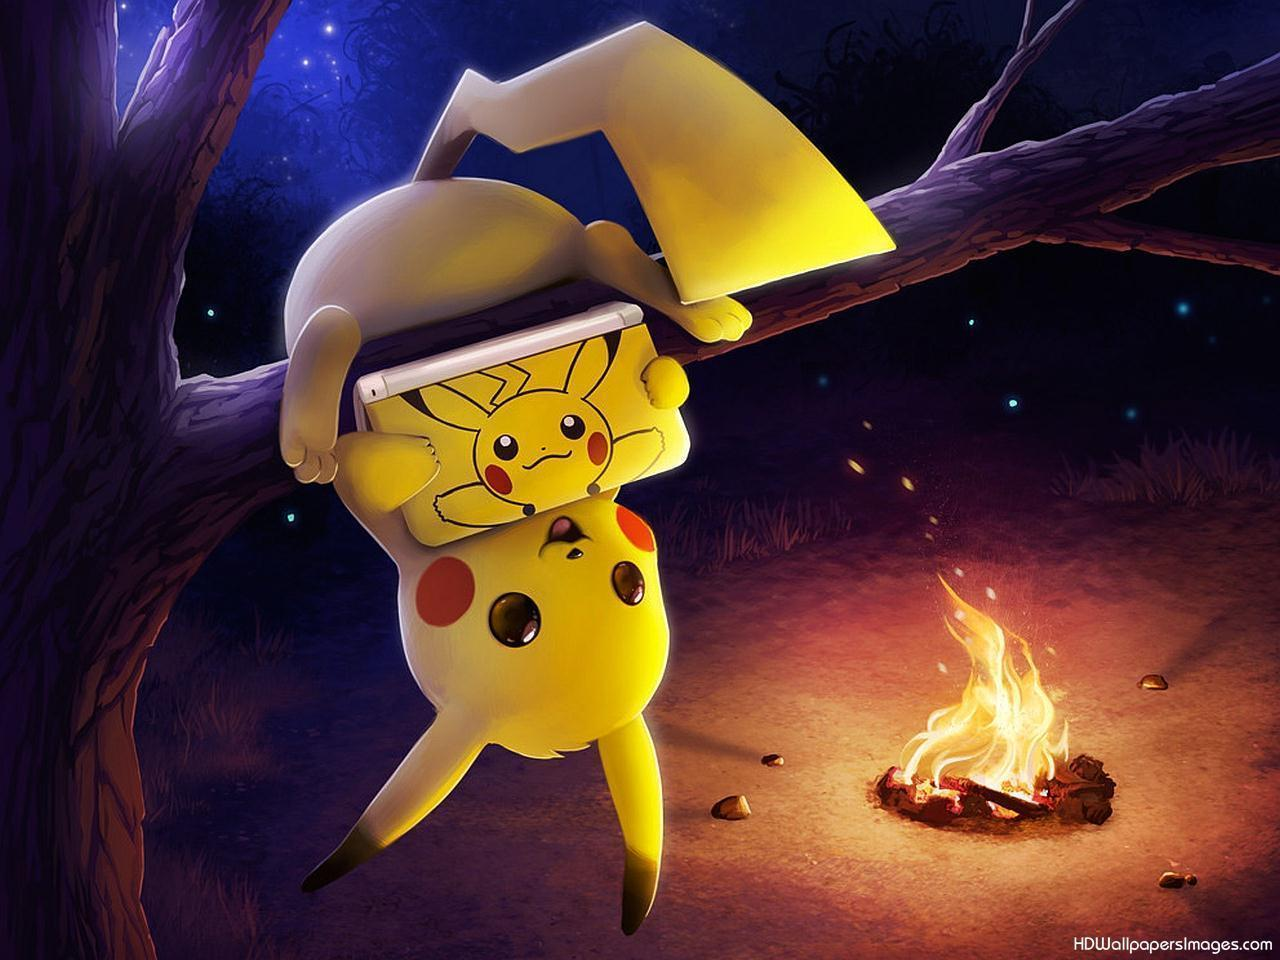 Pokémon Pikachu Wallpapers